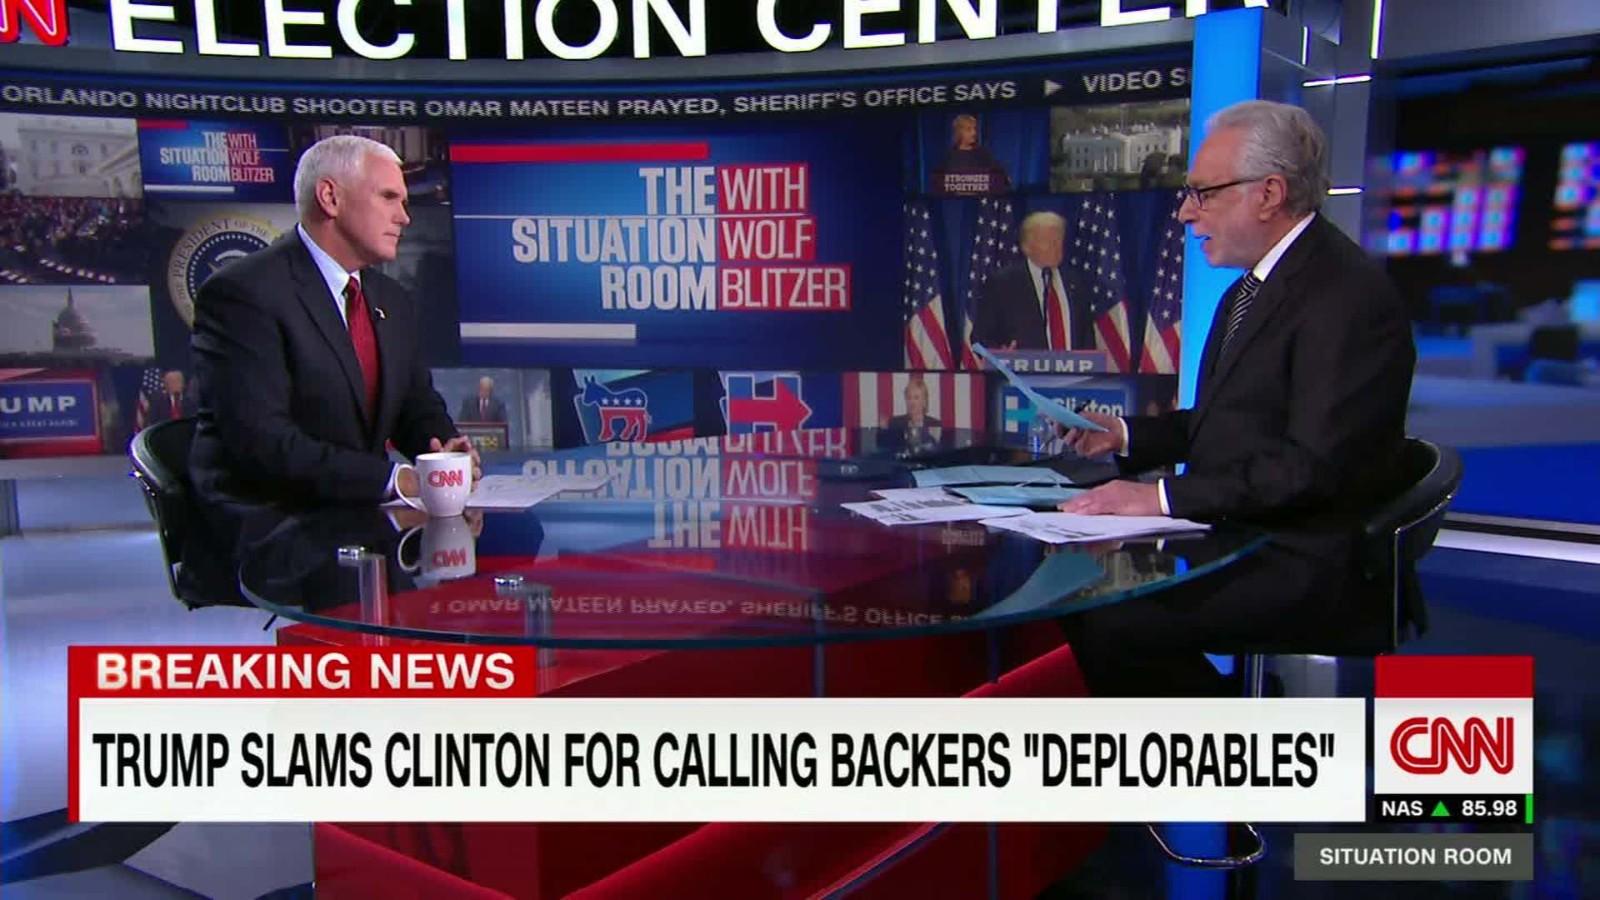 Mike Pence Declines To Call David Duke U0027deplorable,u0027 Disavows Support    CNNPolitics